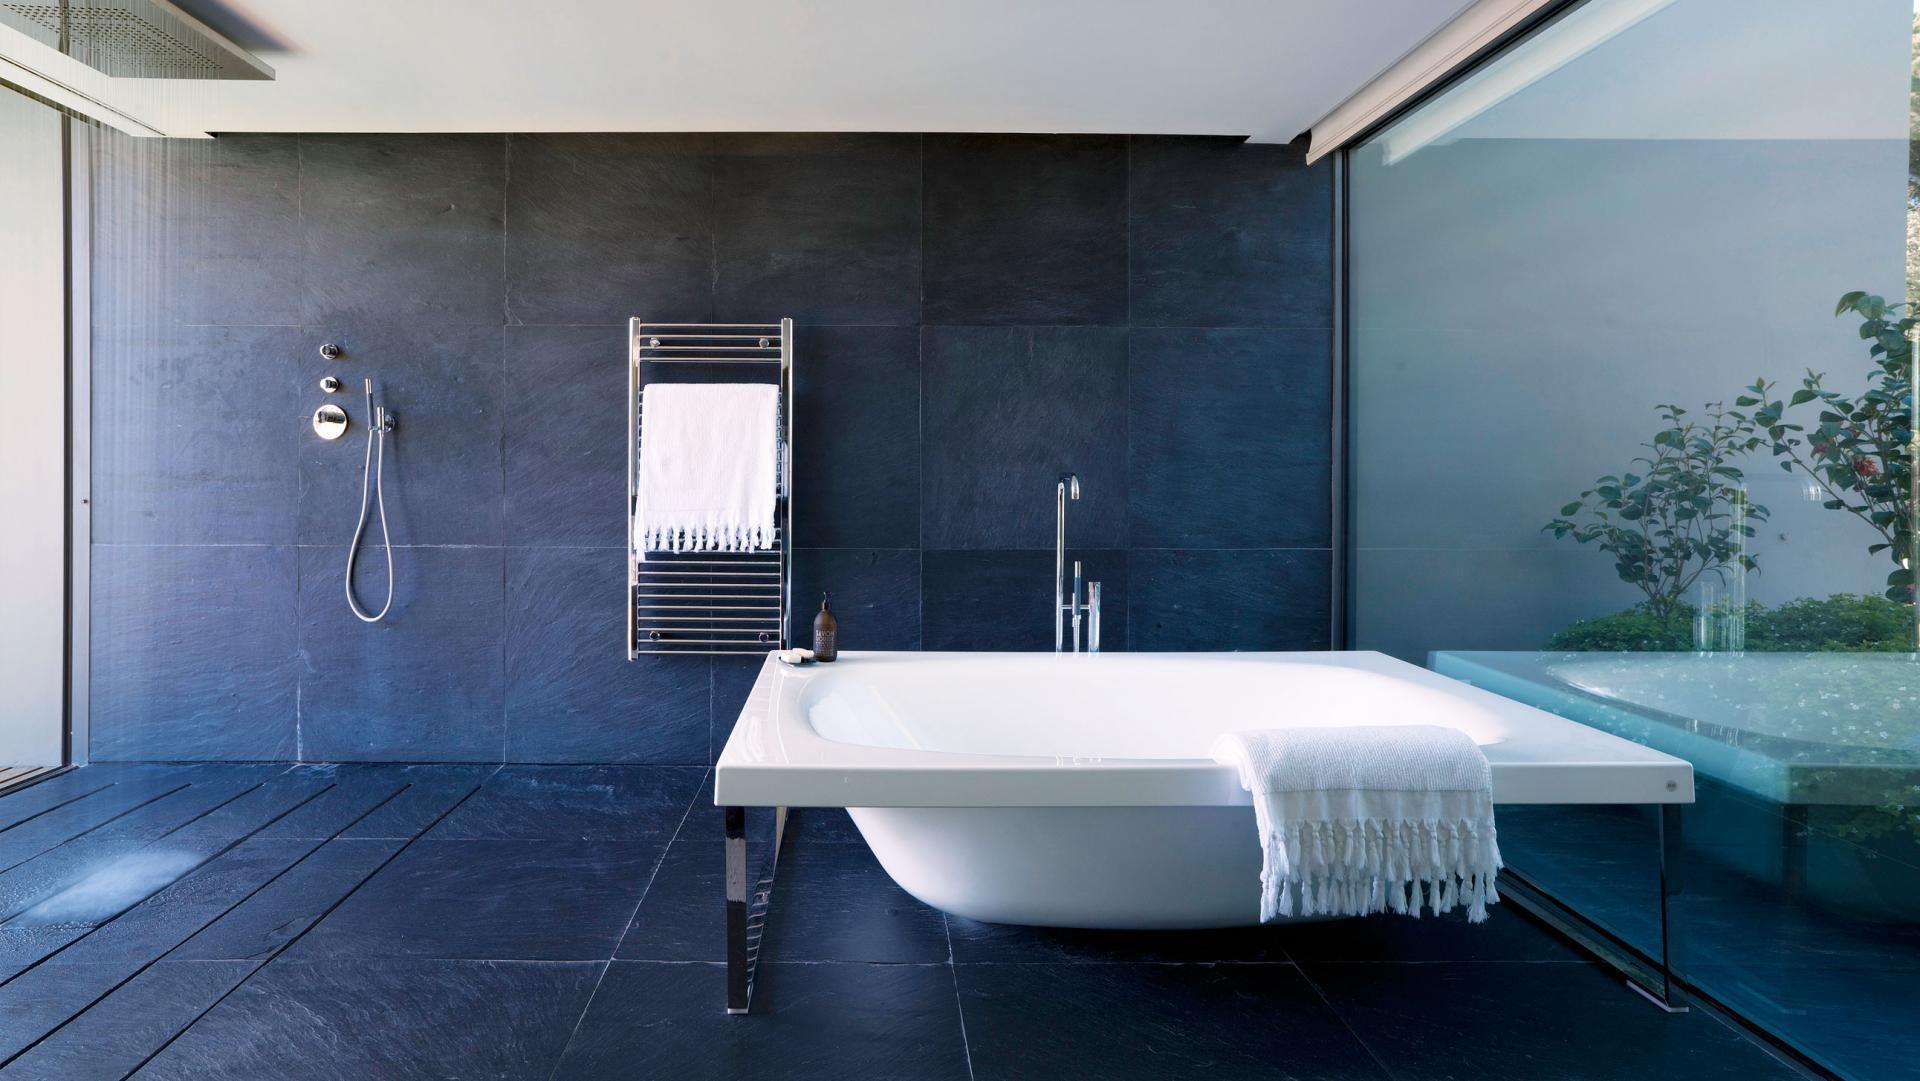 Minimalist Style Bathroom Wet Room Walk In Shower Oversized Tub